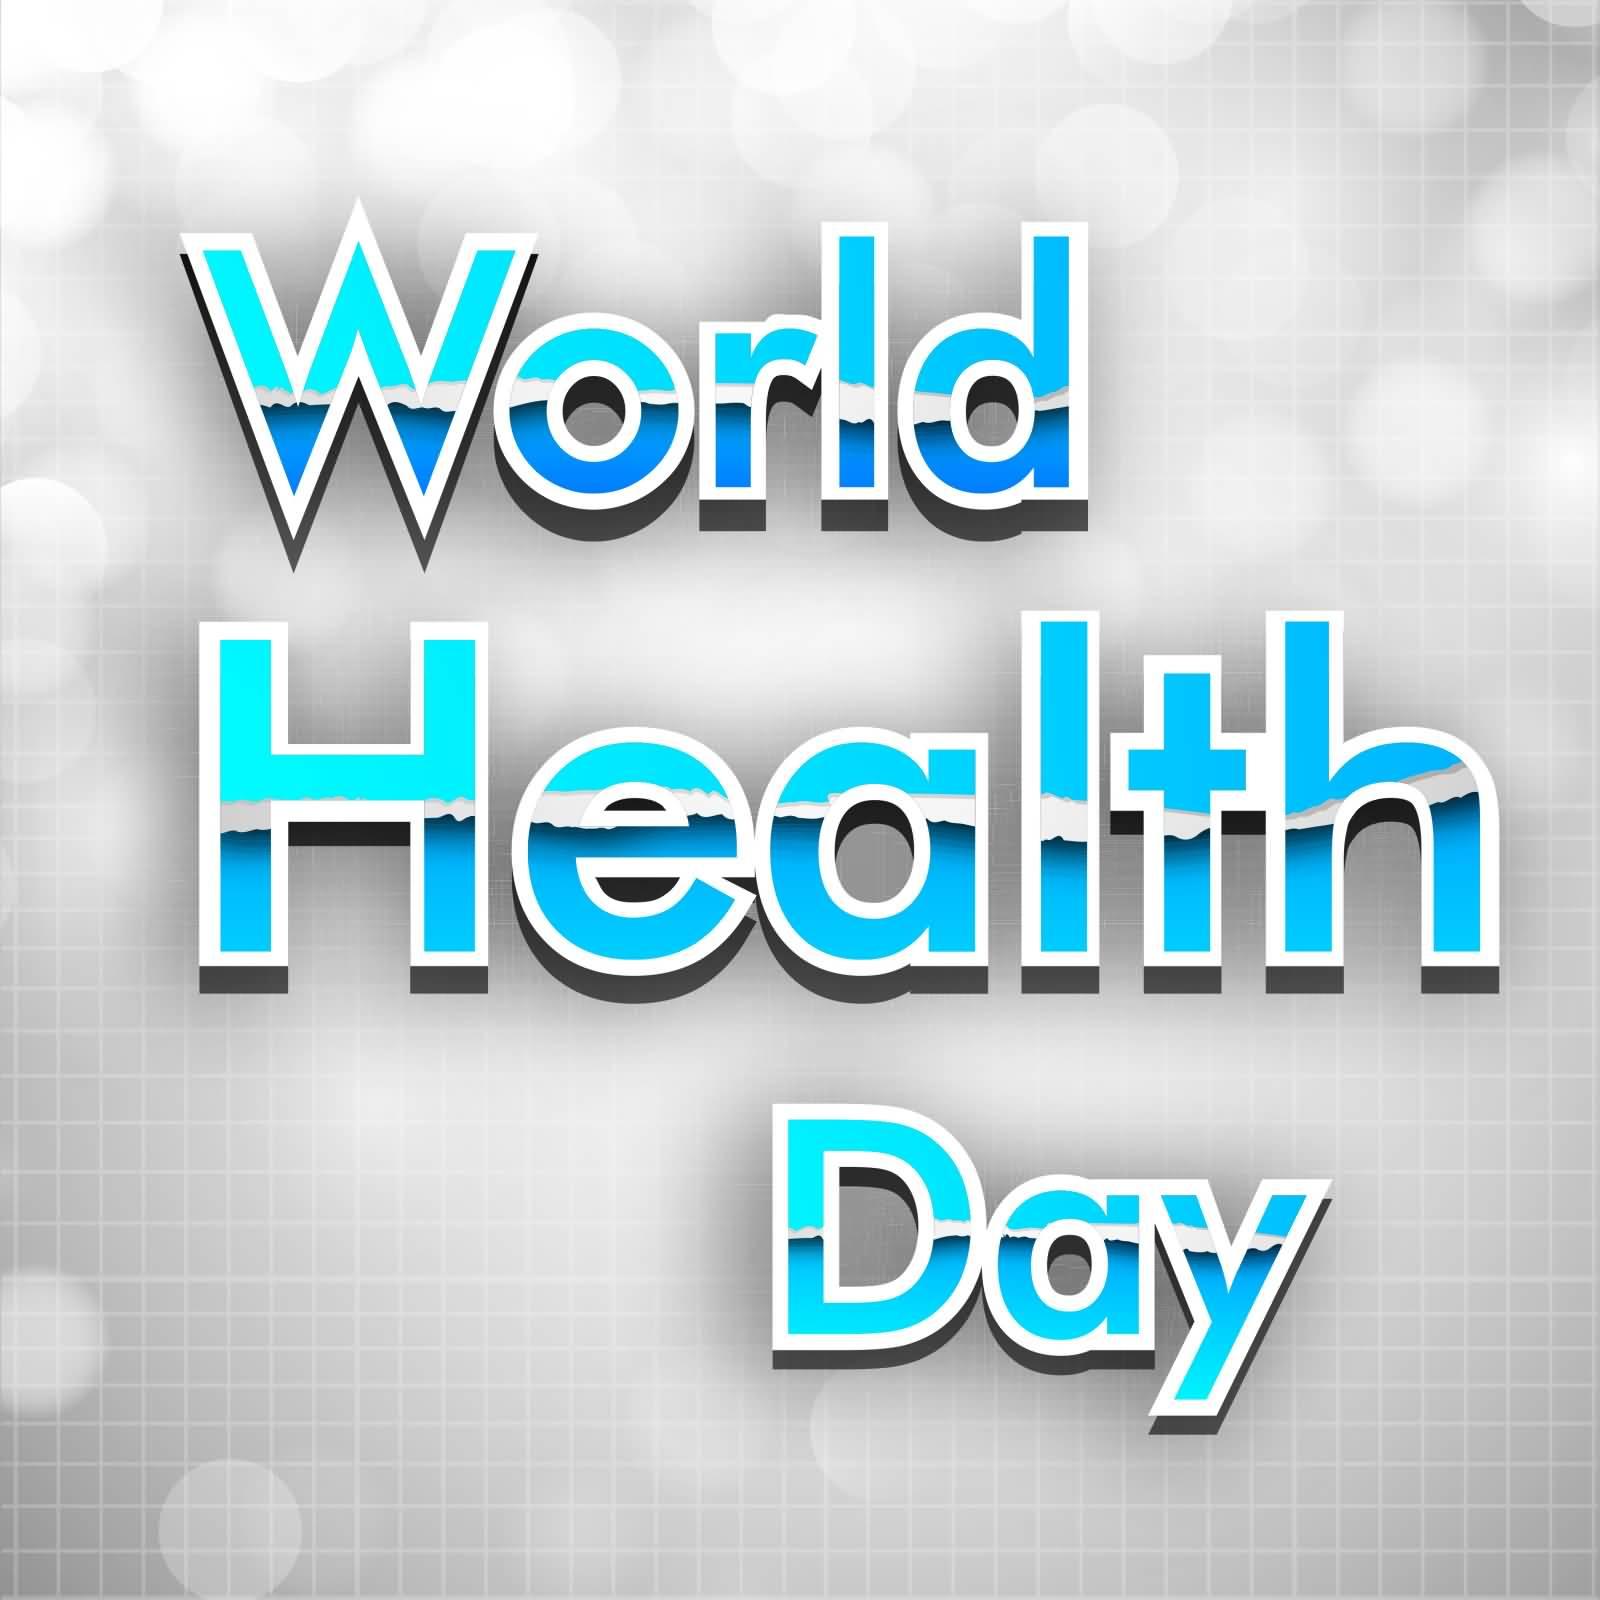 World Health Day 2017 Wishes